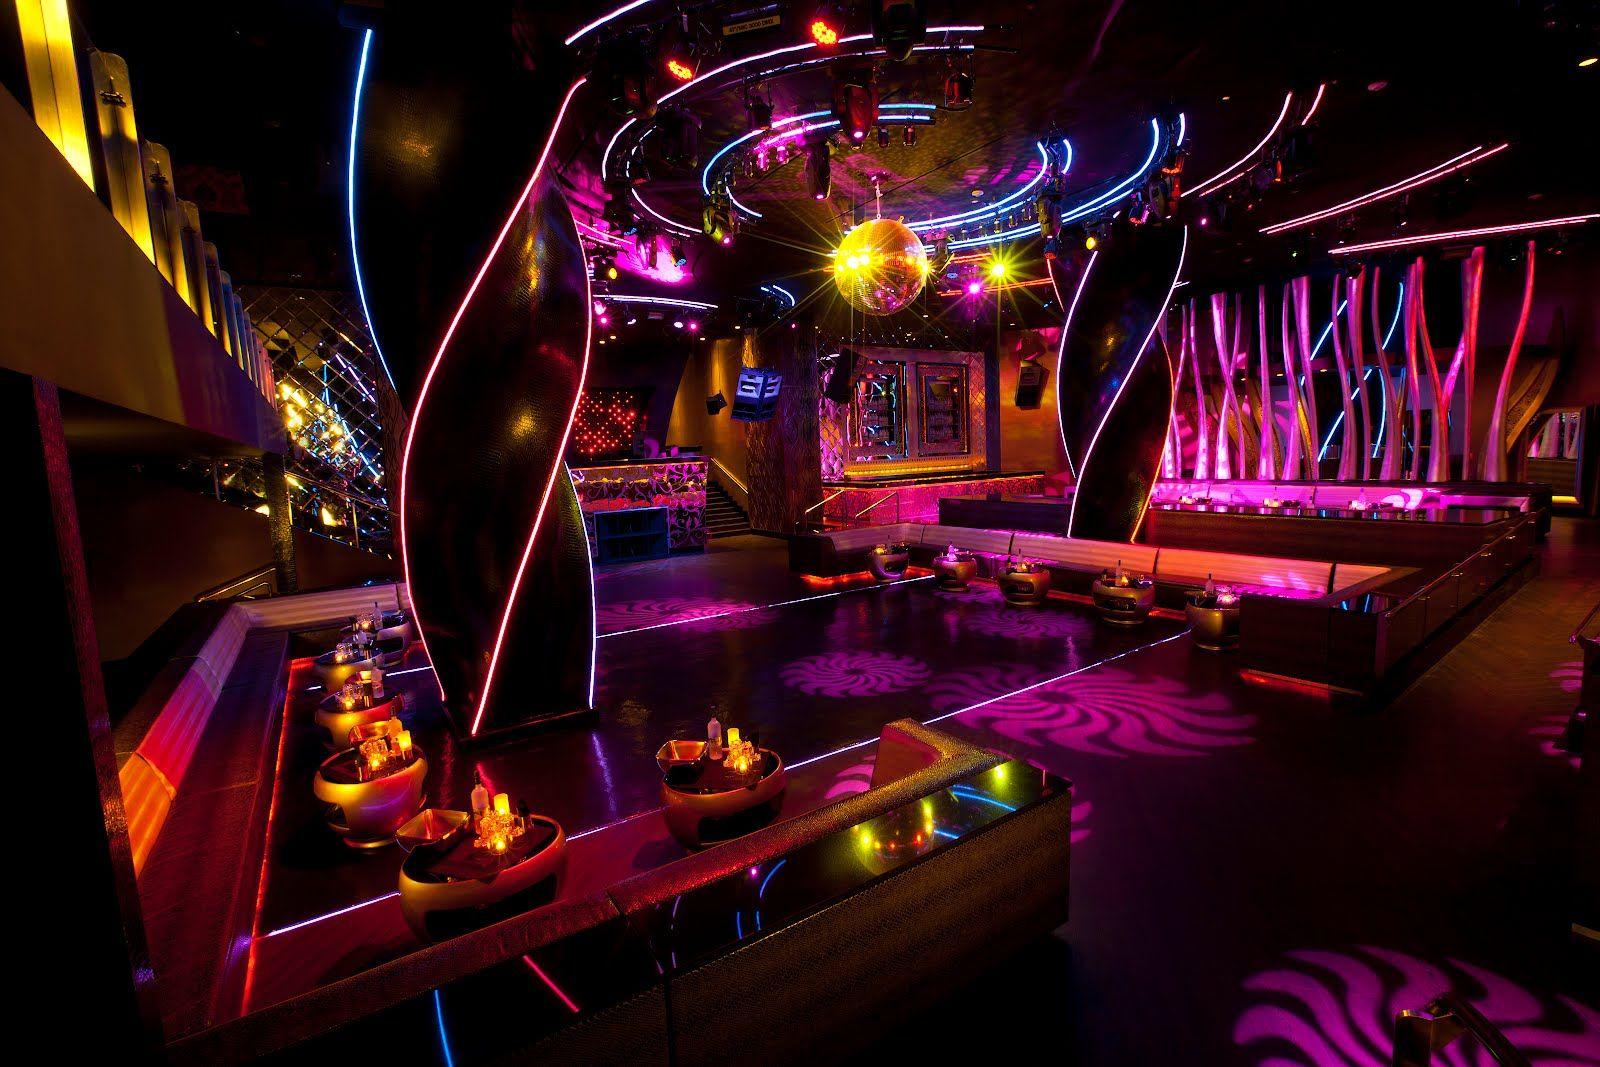 Vip Area Hard Rock Hotel Night Club Nightclub Design